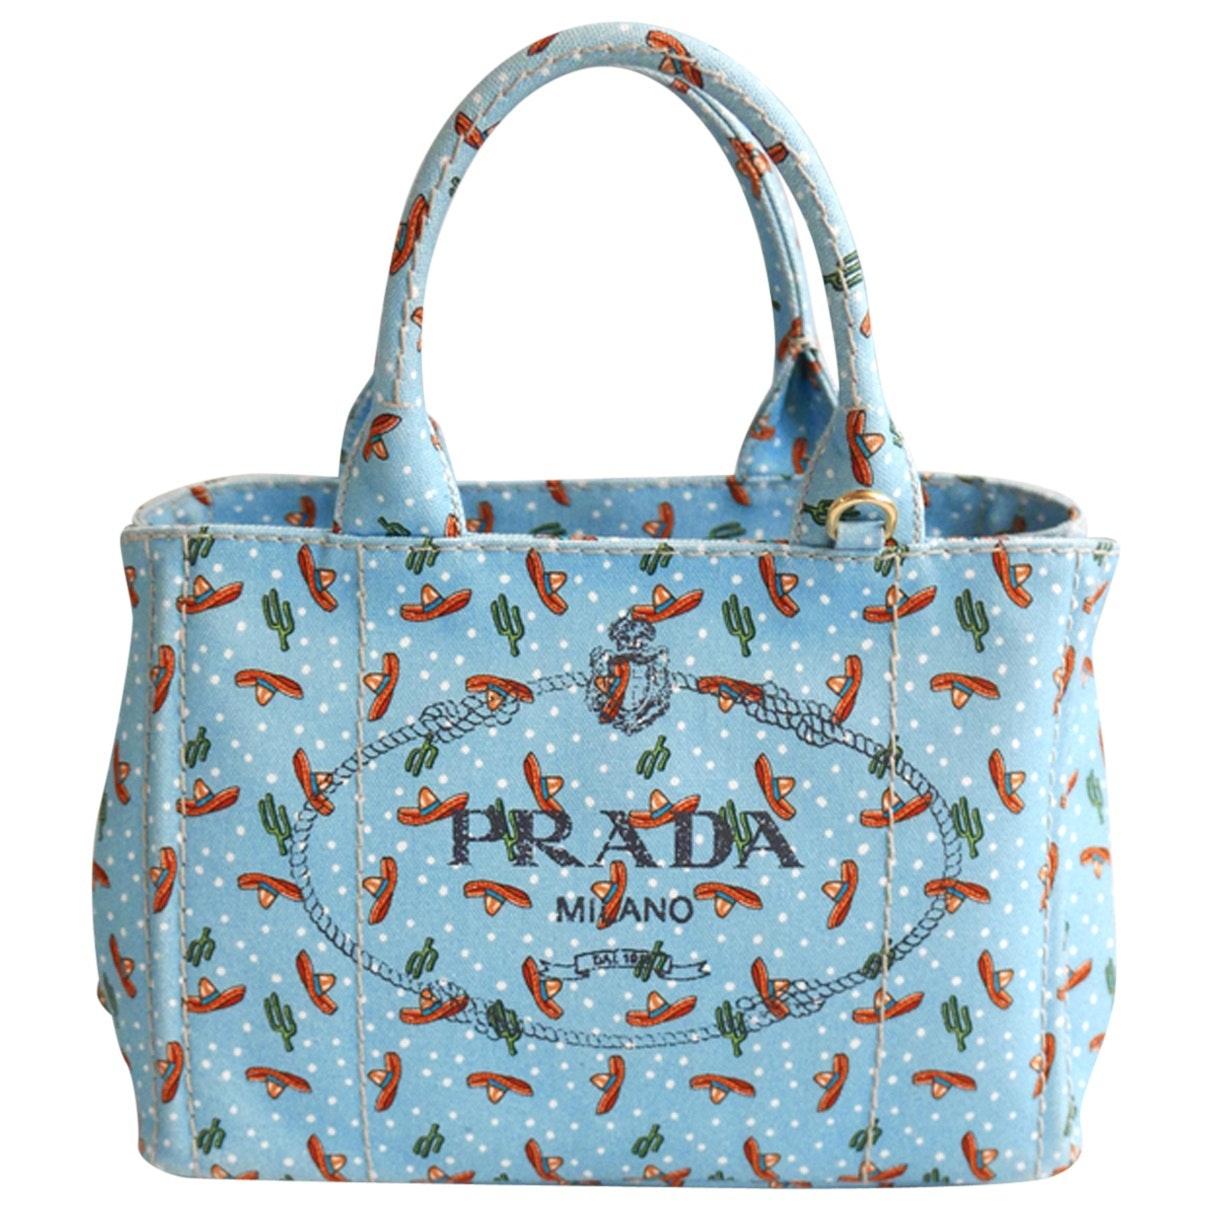 c2076e44084d Prada Ltd Ed Sombrero Print Giardiniera Tote Bag